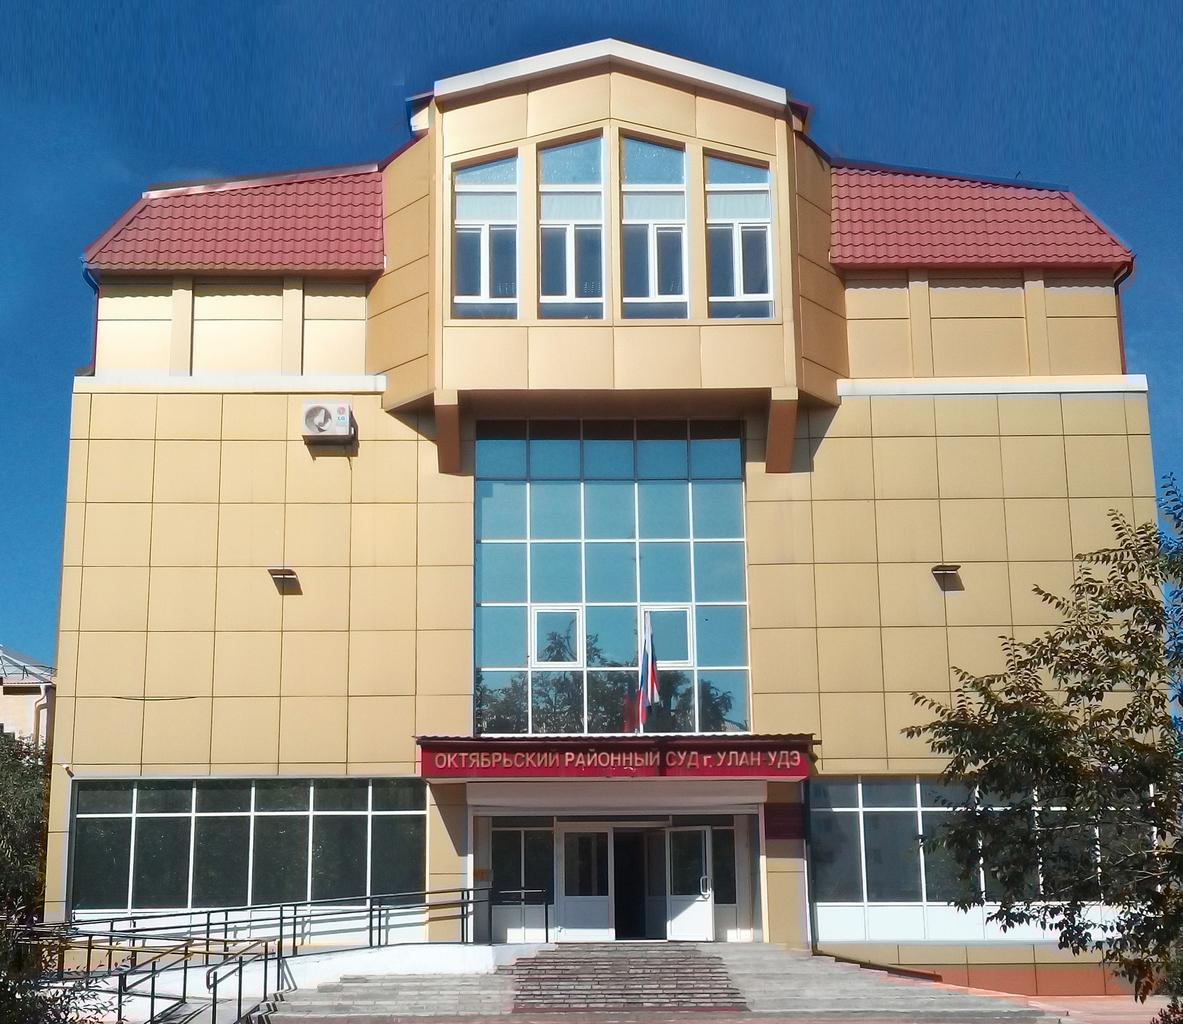 Октябрьский районный суд г. Улан-Удэ